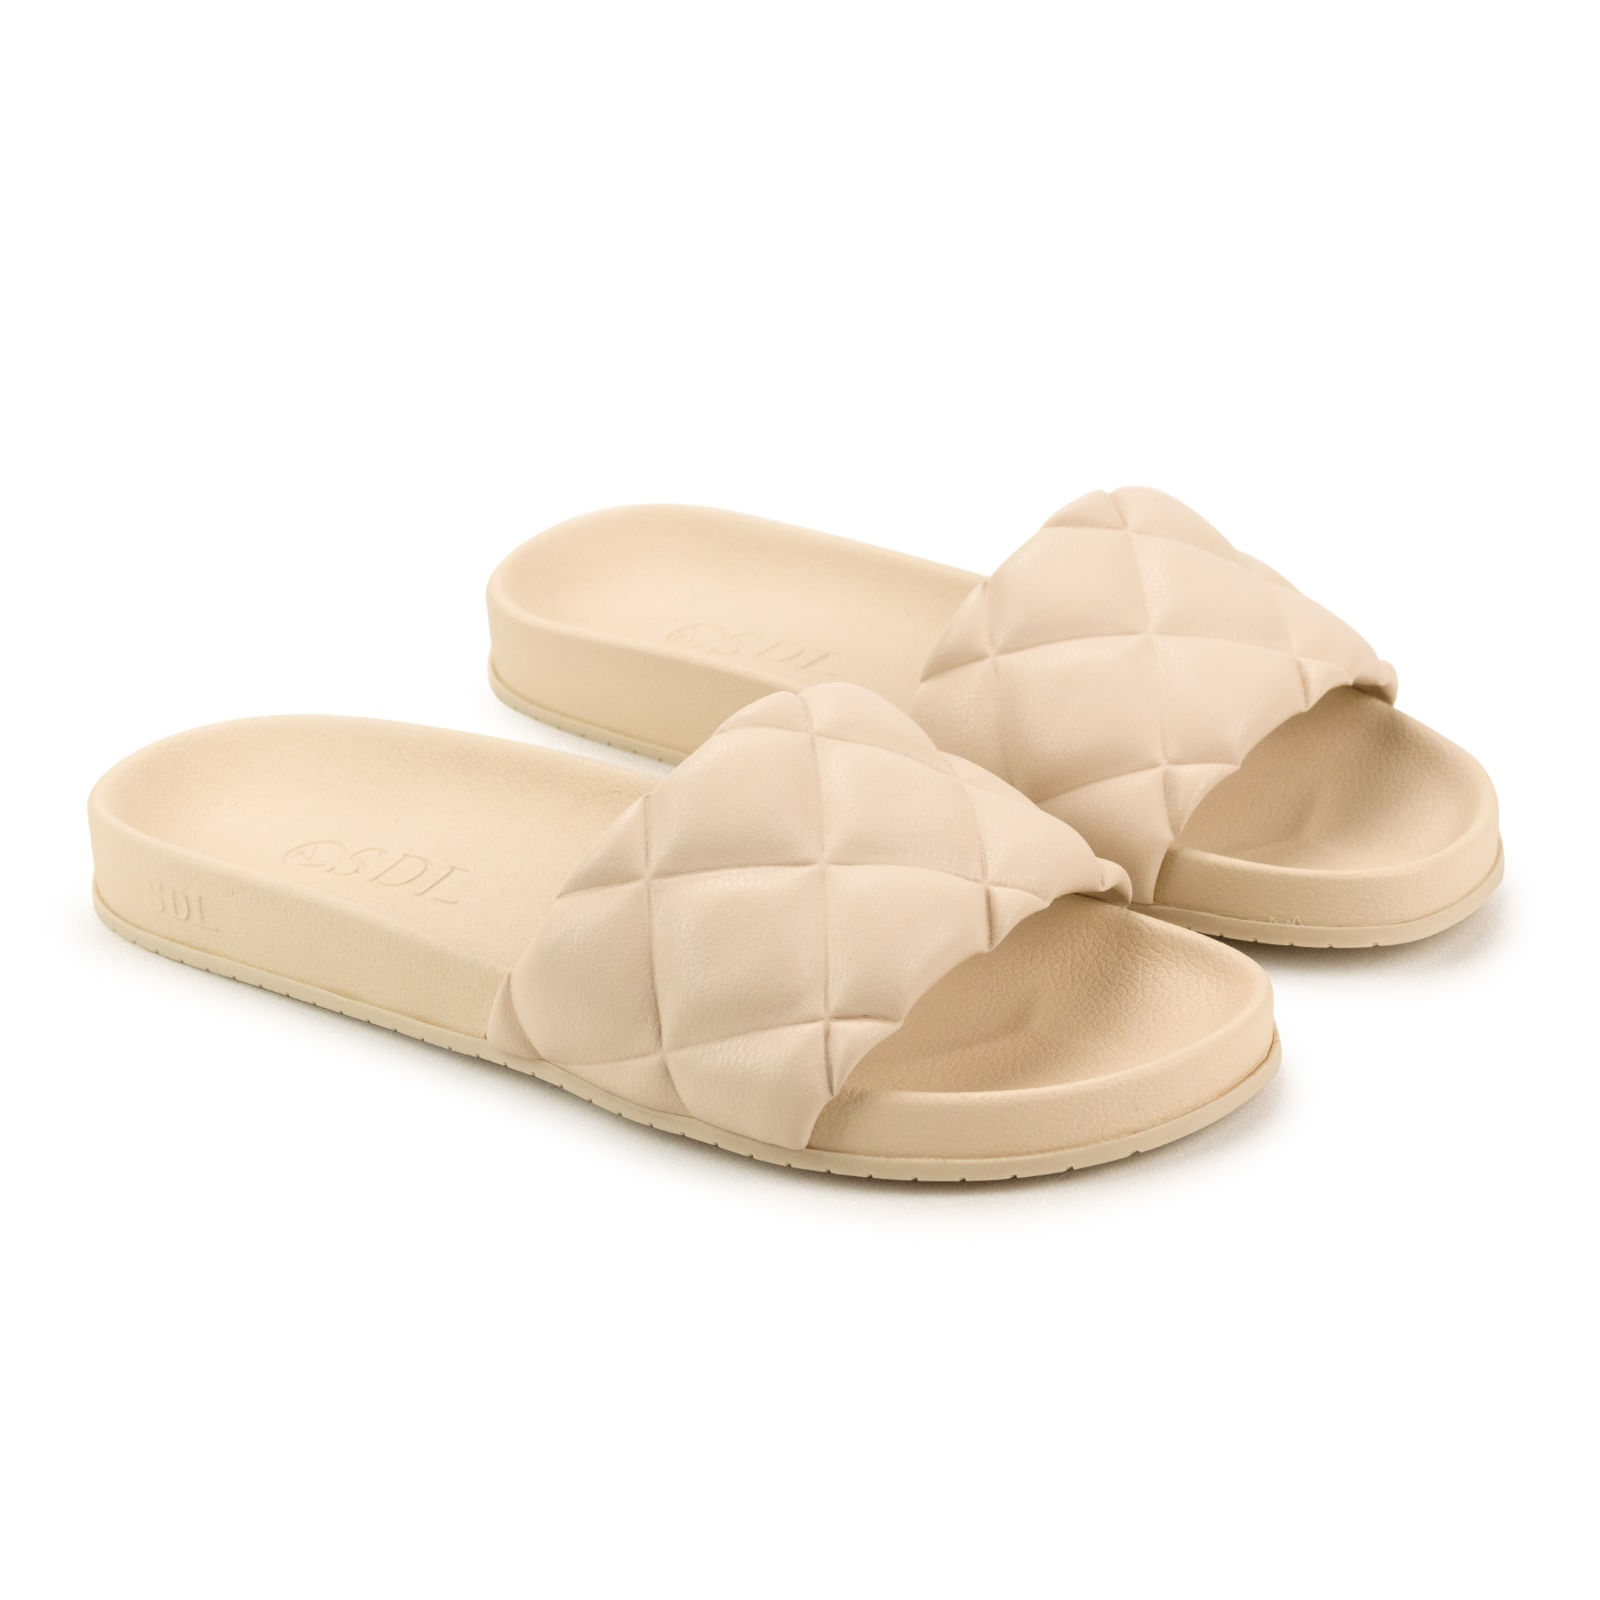 Rasteira Napa Soft Nude Manteiga Matelassê